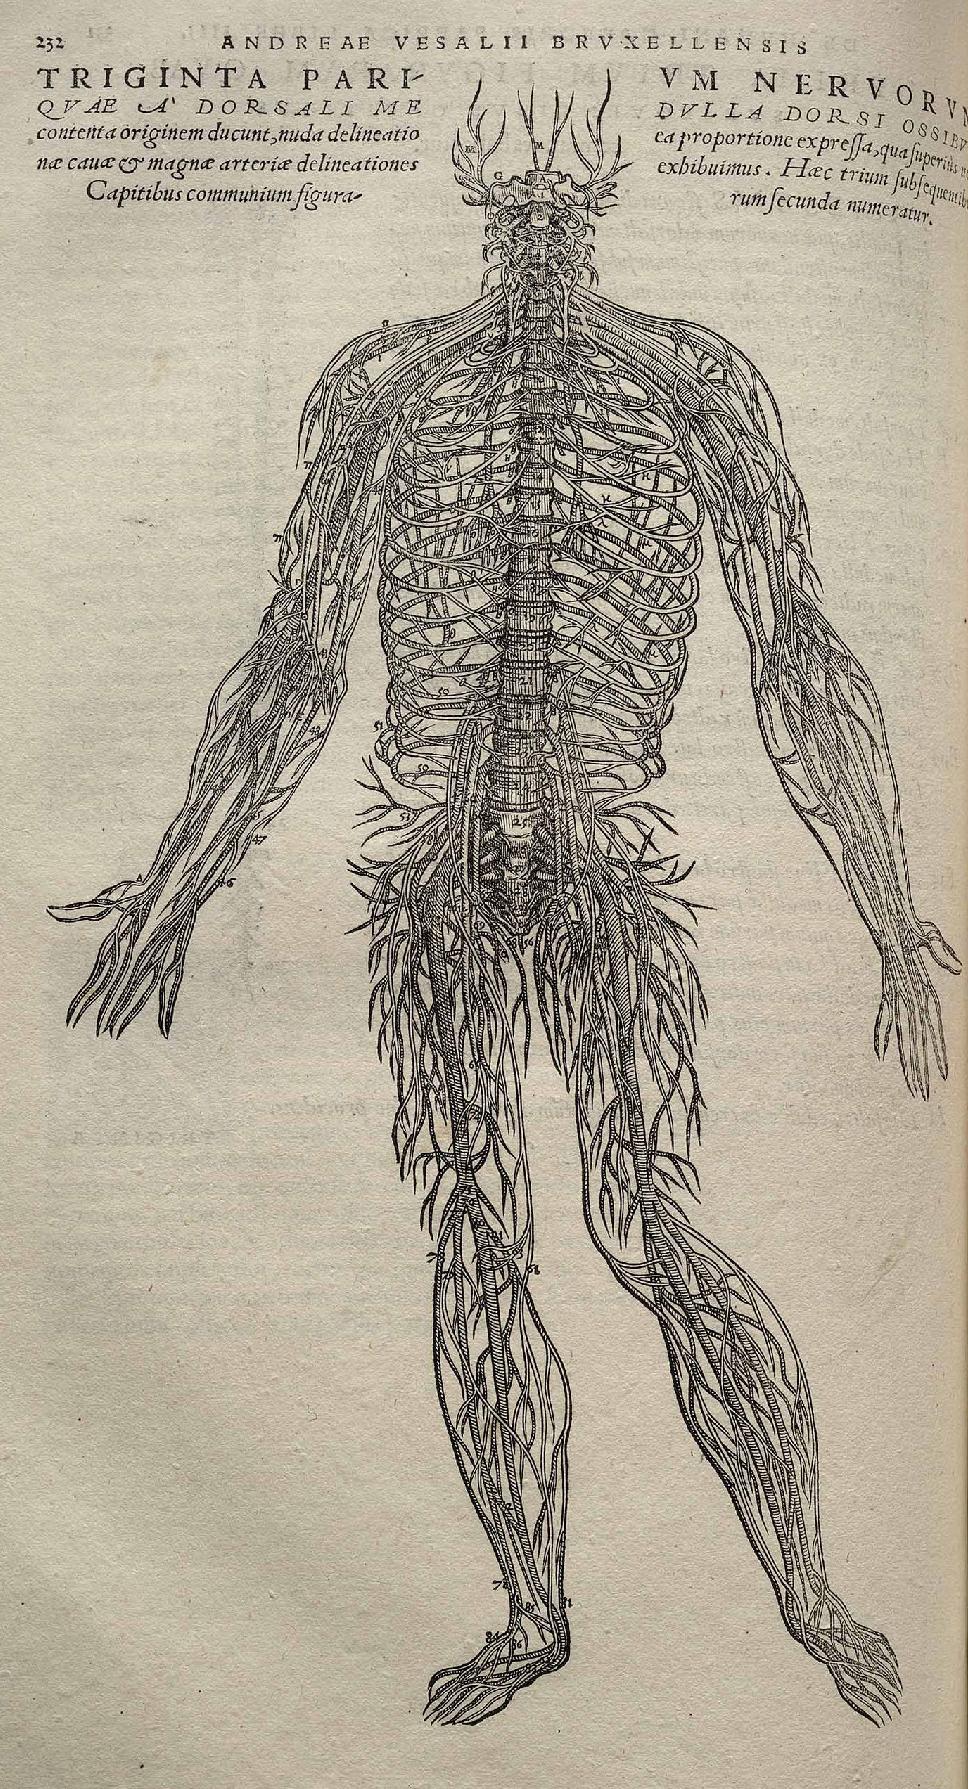 Peripheres Nervensystem – Wikipedia